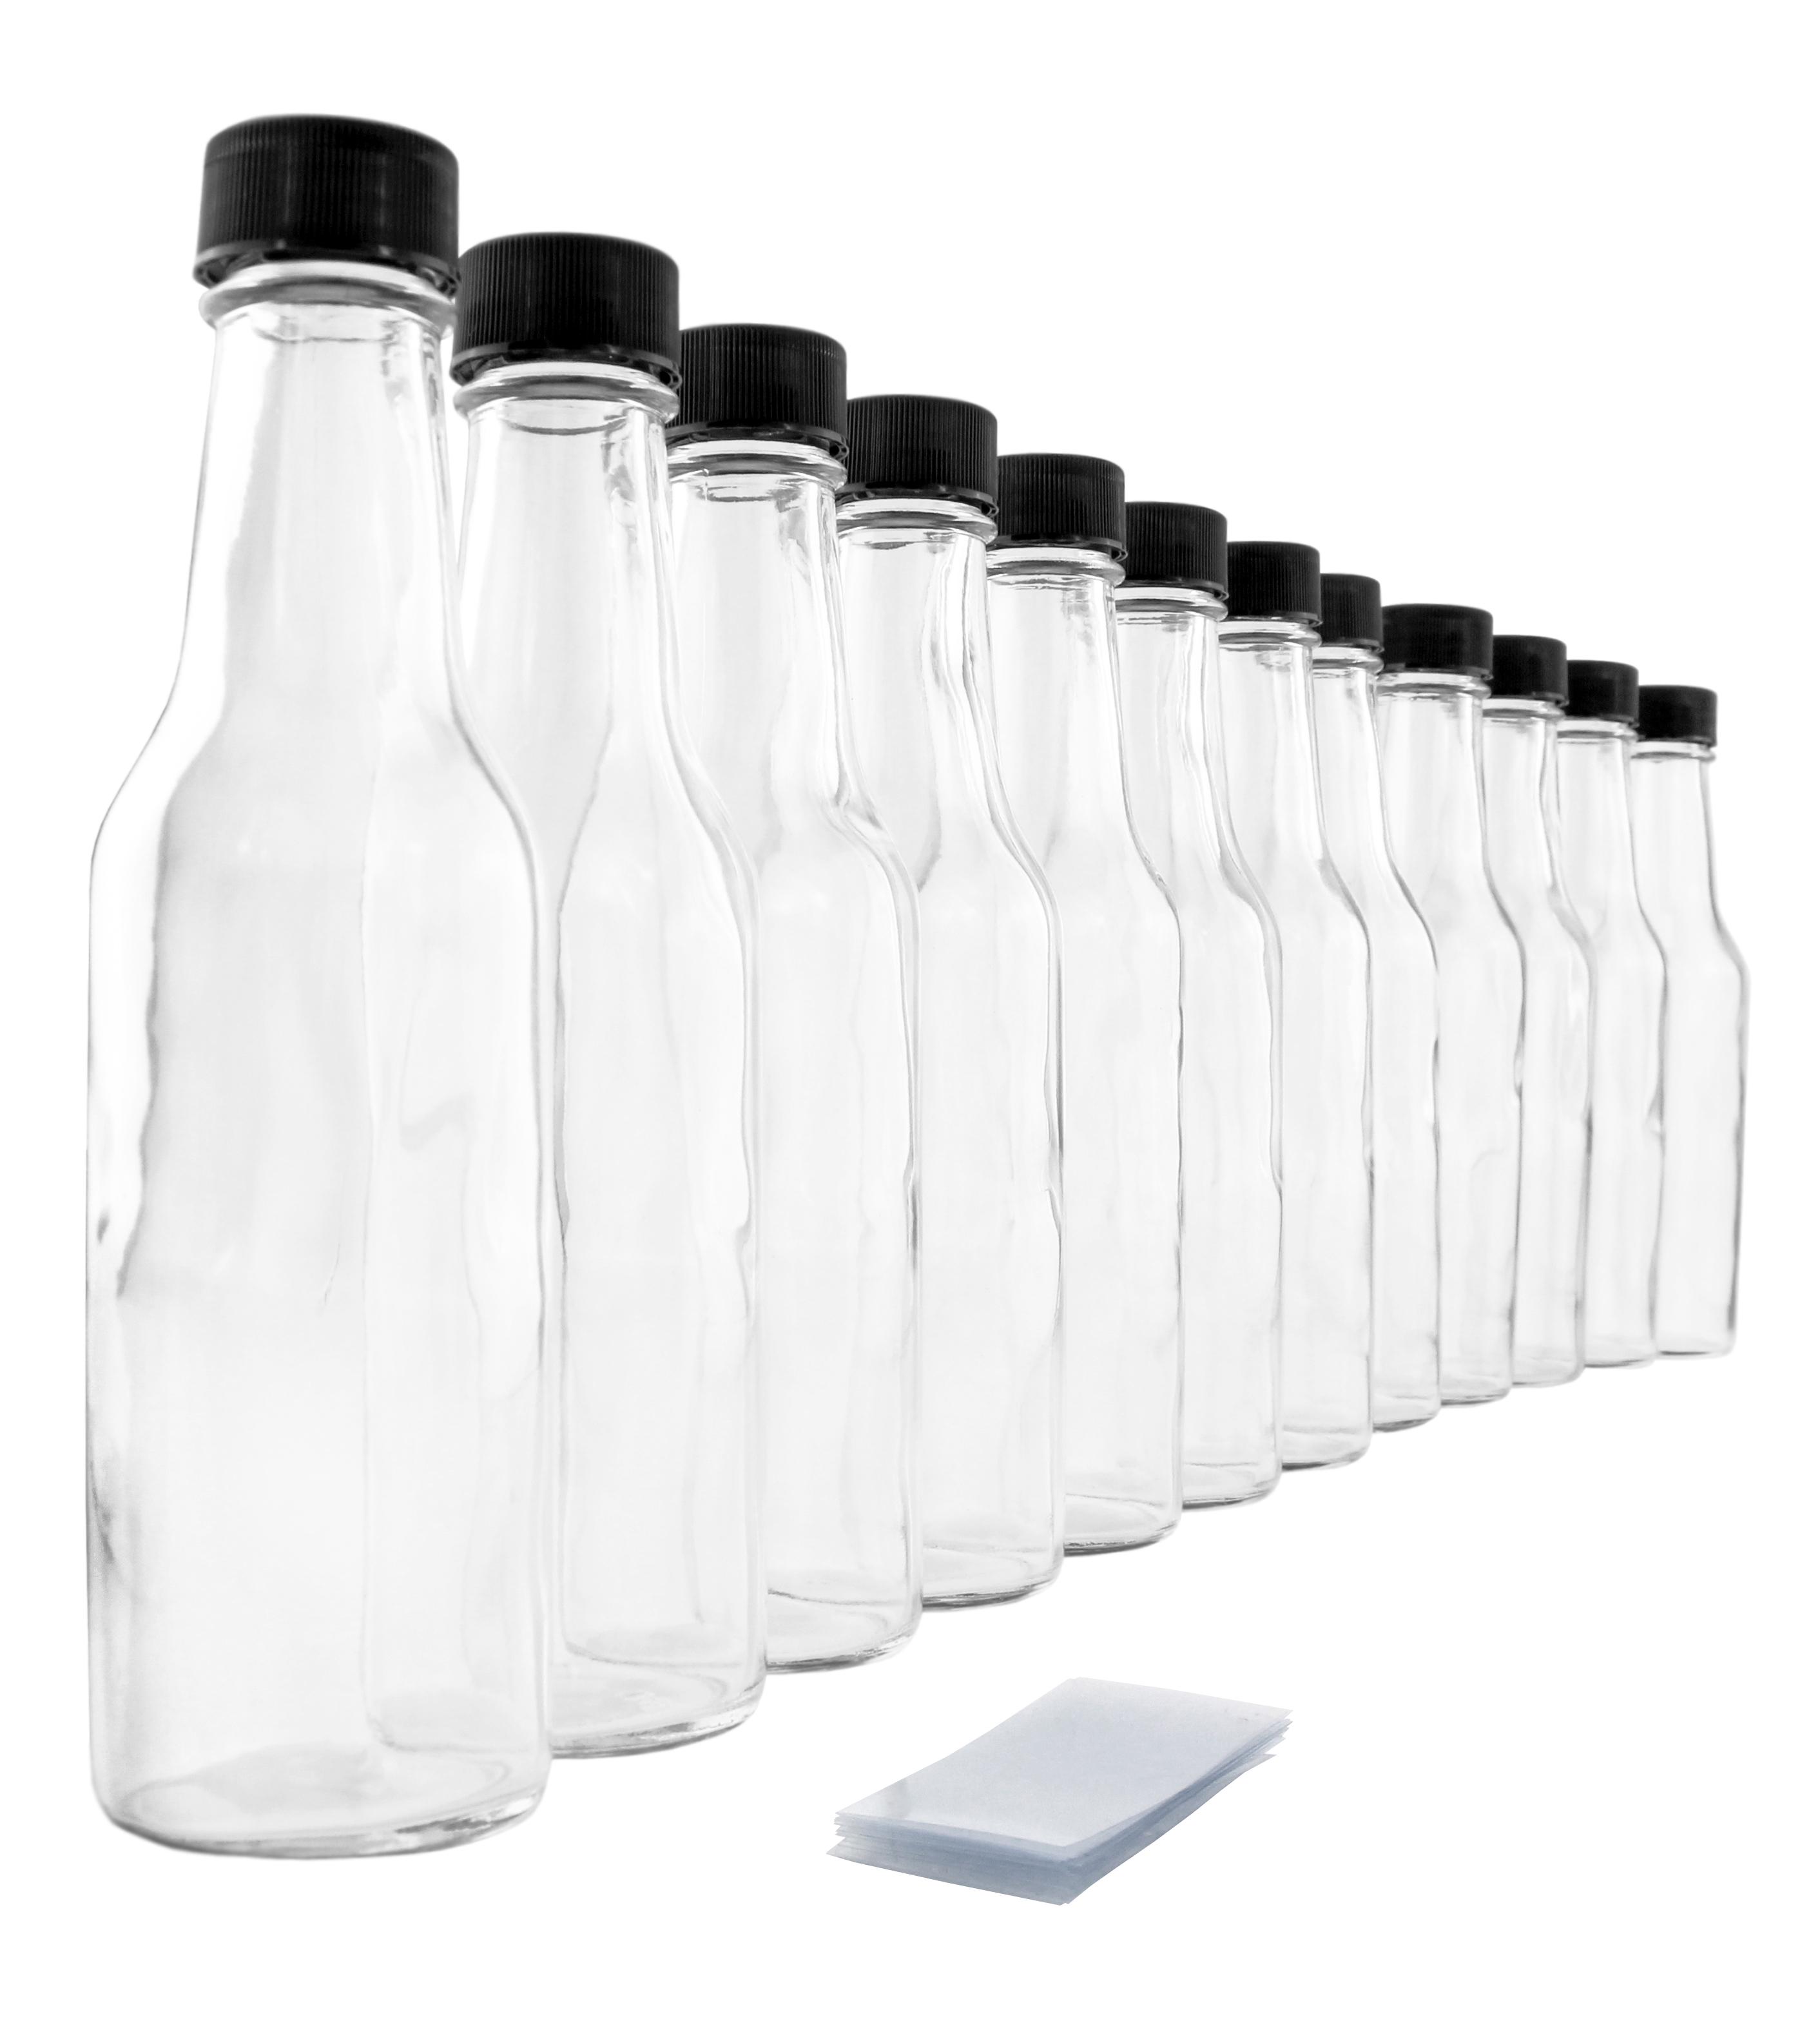 B016LPPR4Q - 5oz Empty Hot Sauce Woozy Bottles (12 Complete Bottles) 1